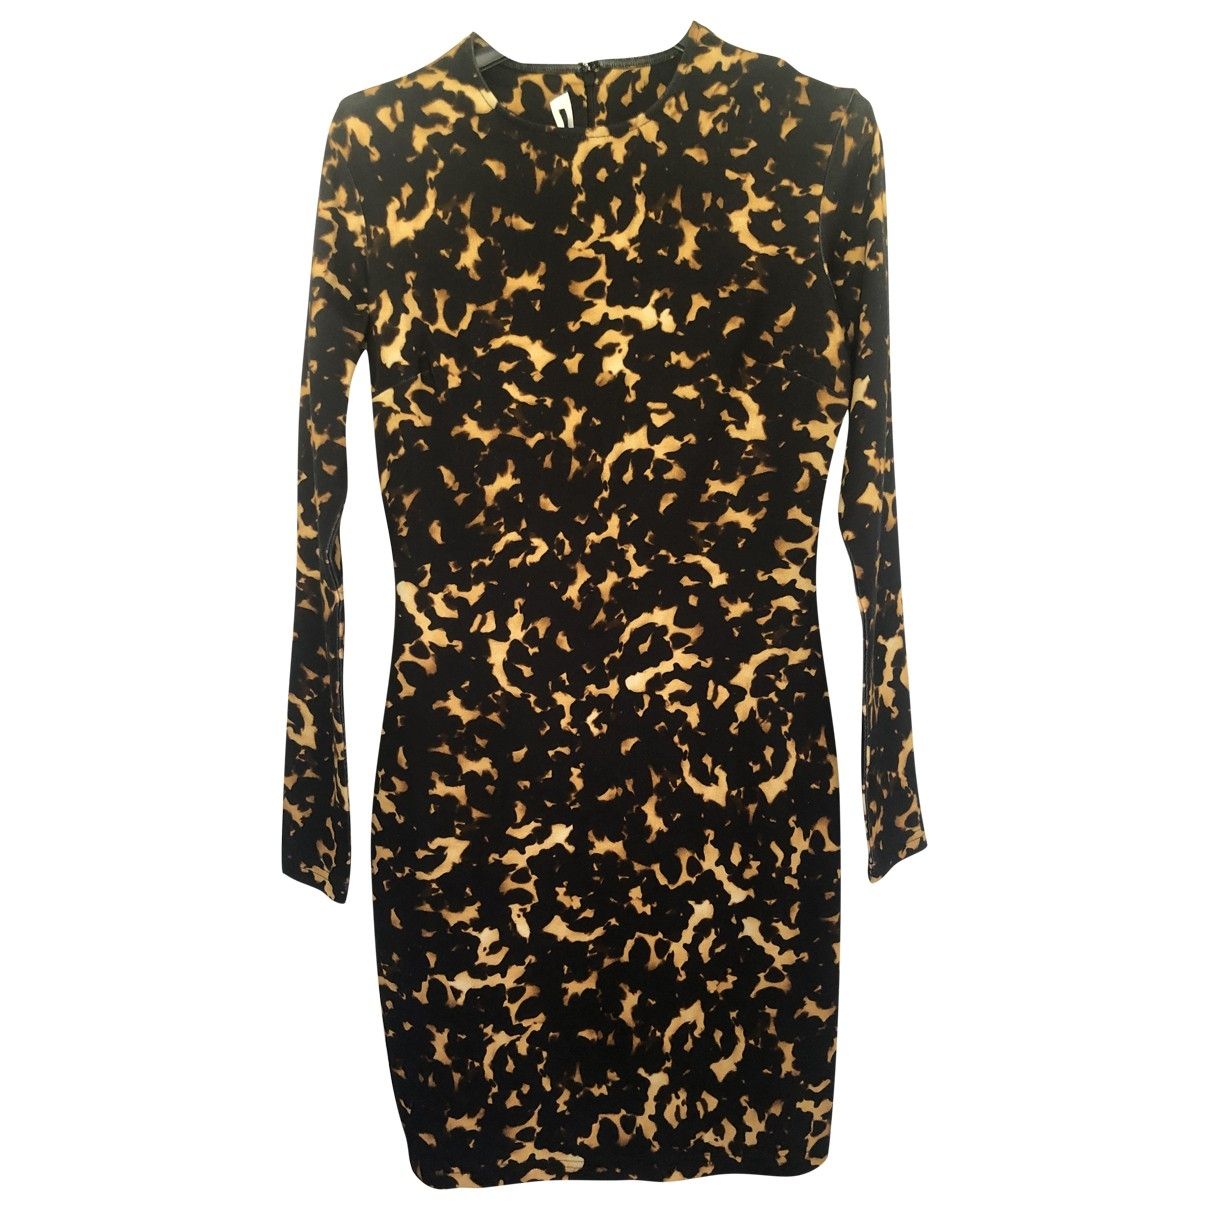 Mcq \N Black Cotton dress for Women M International